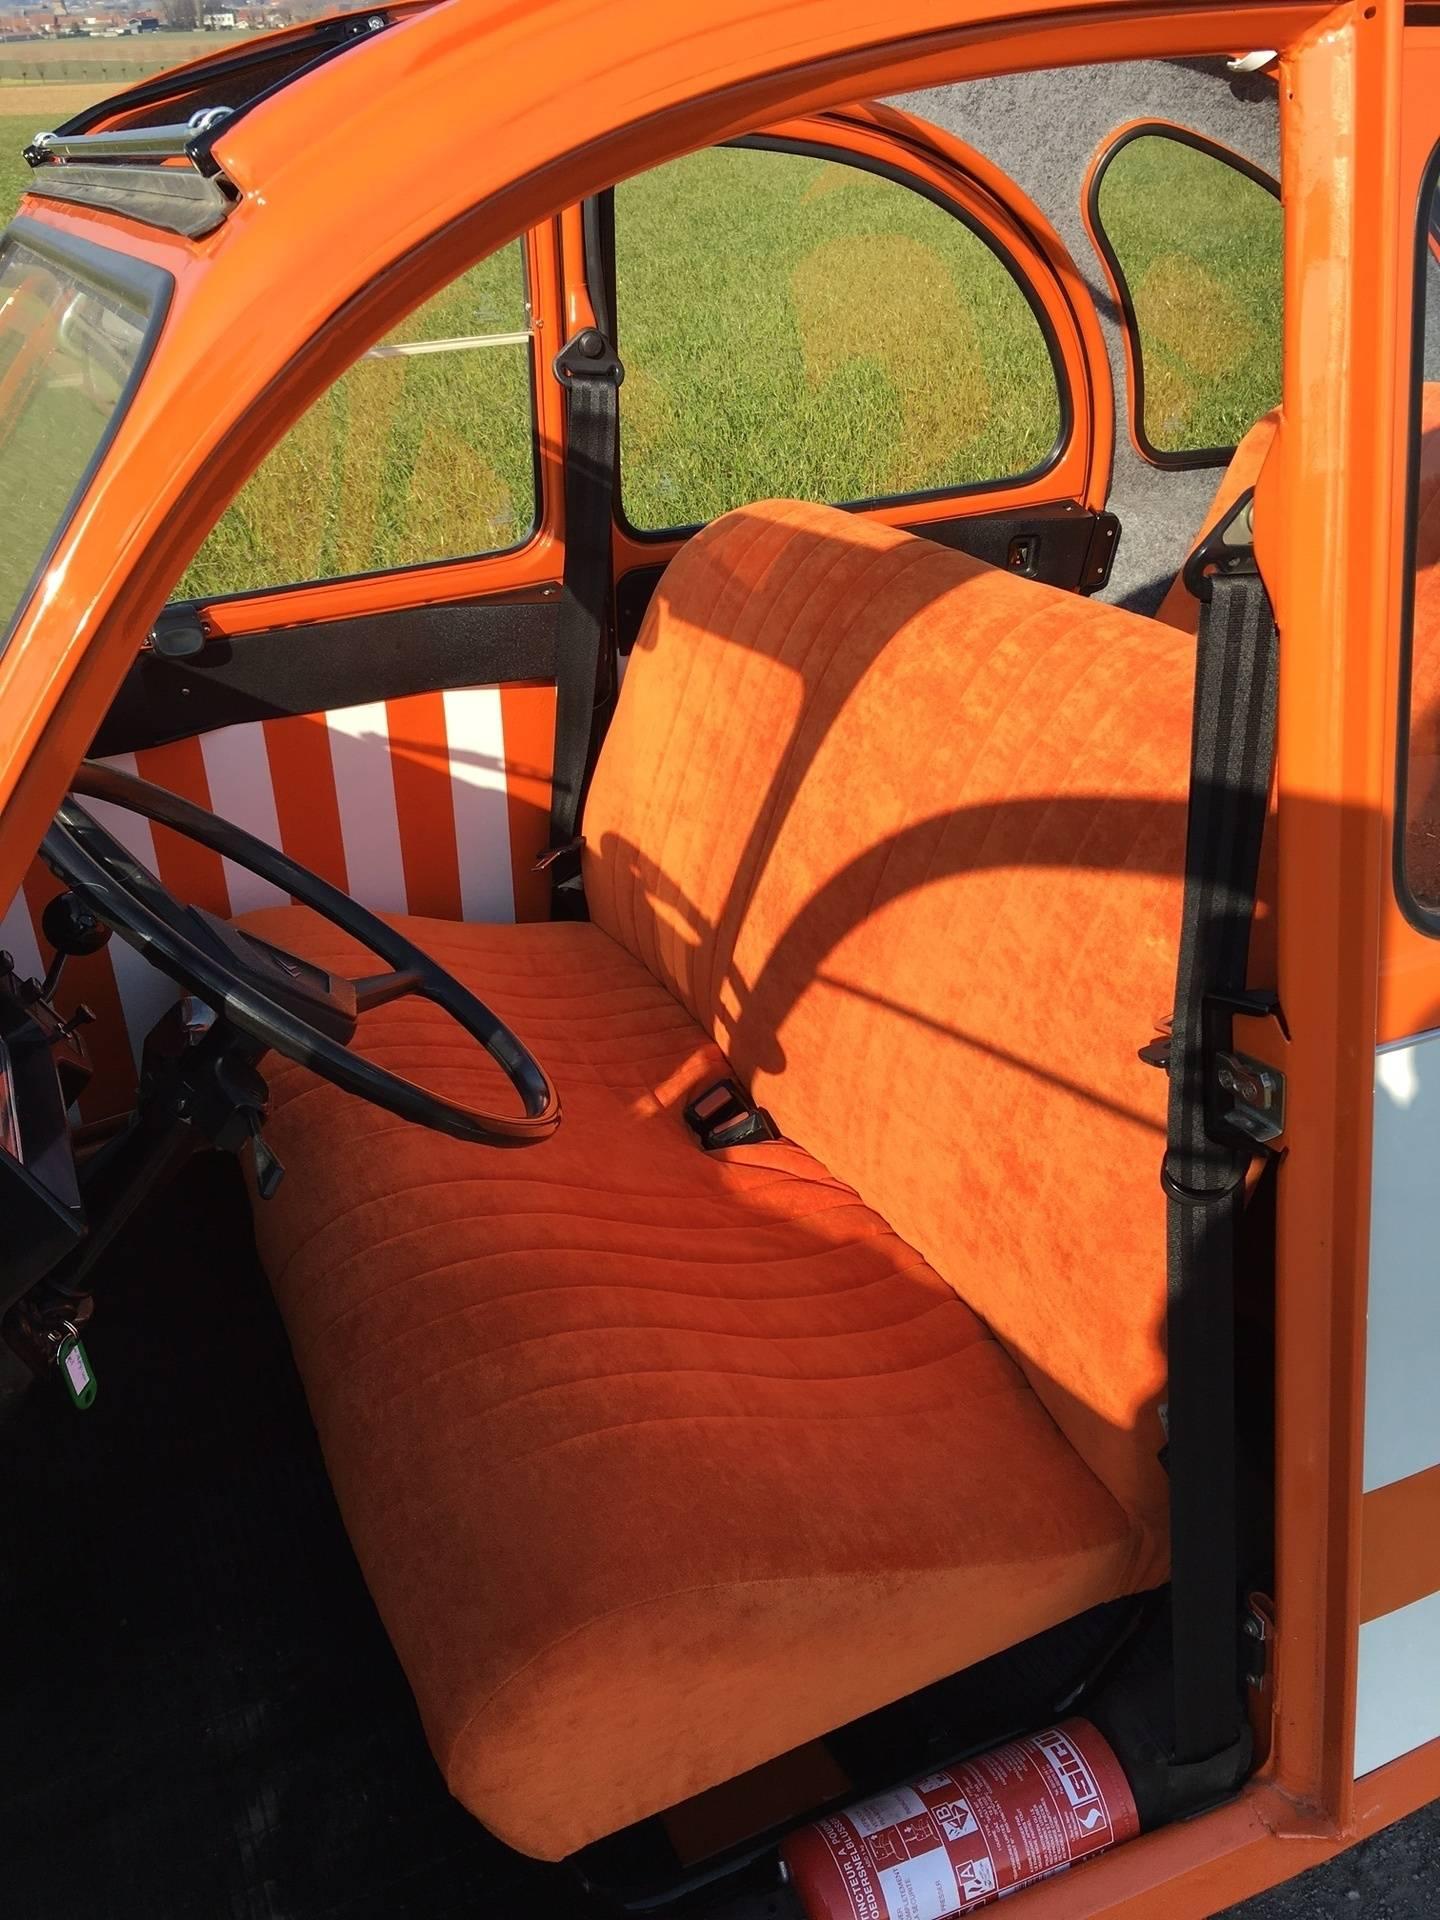 Voorbank in oranje fluweel